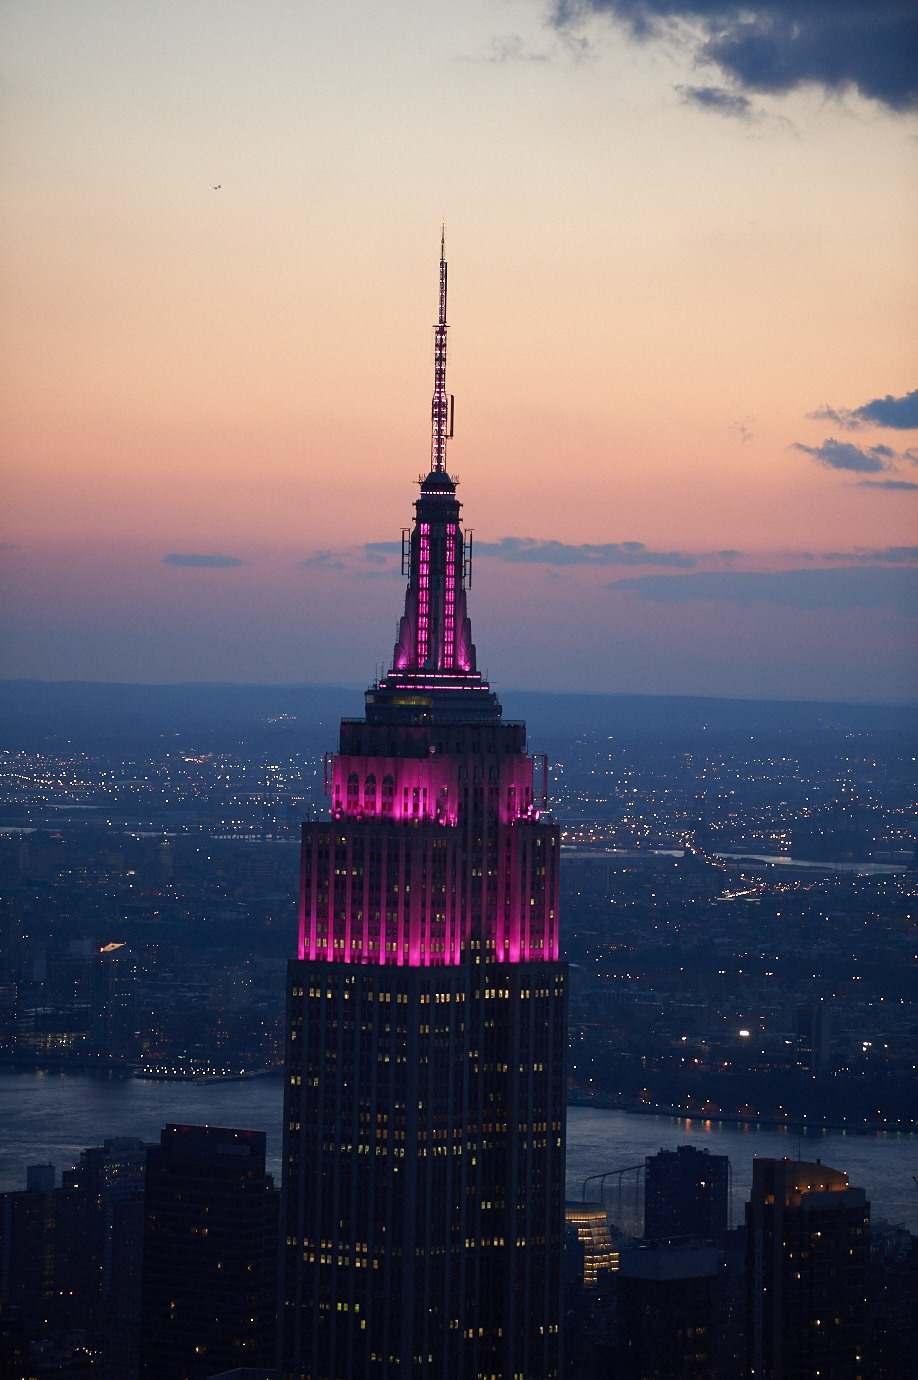 Tower Lighting 2019 03 08 00:00:00 | Empire State Building Regarding Empire State Building Lights Calendar